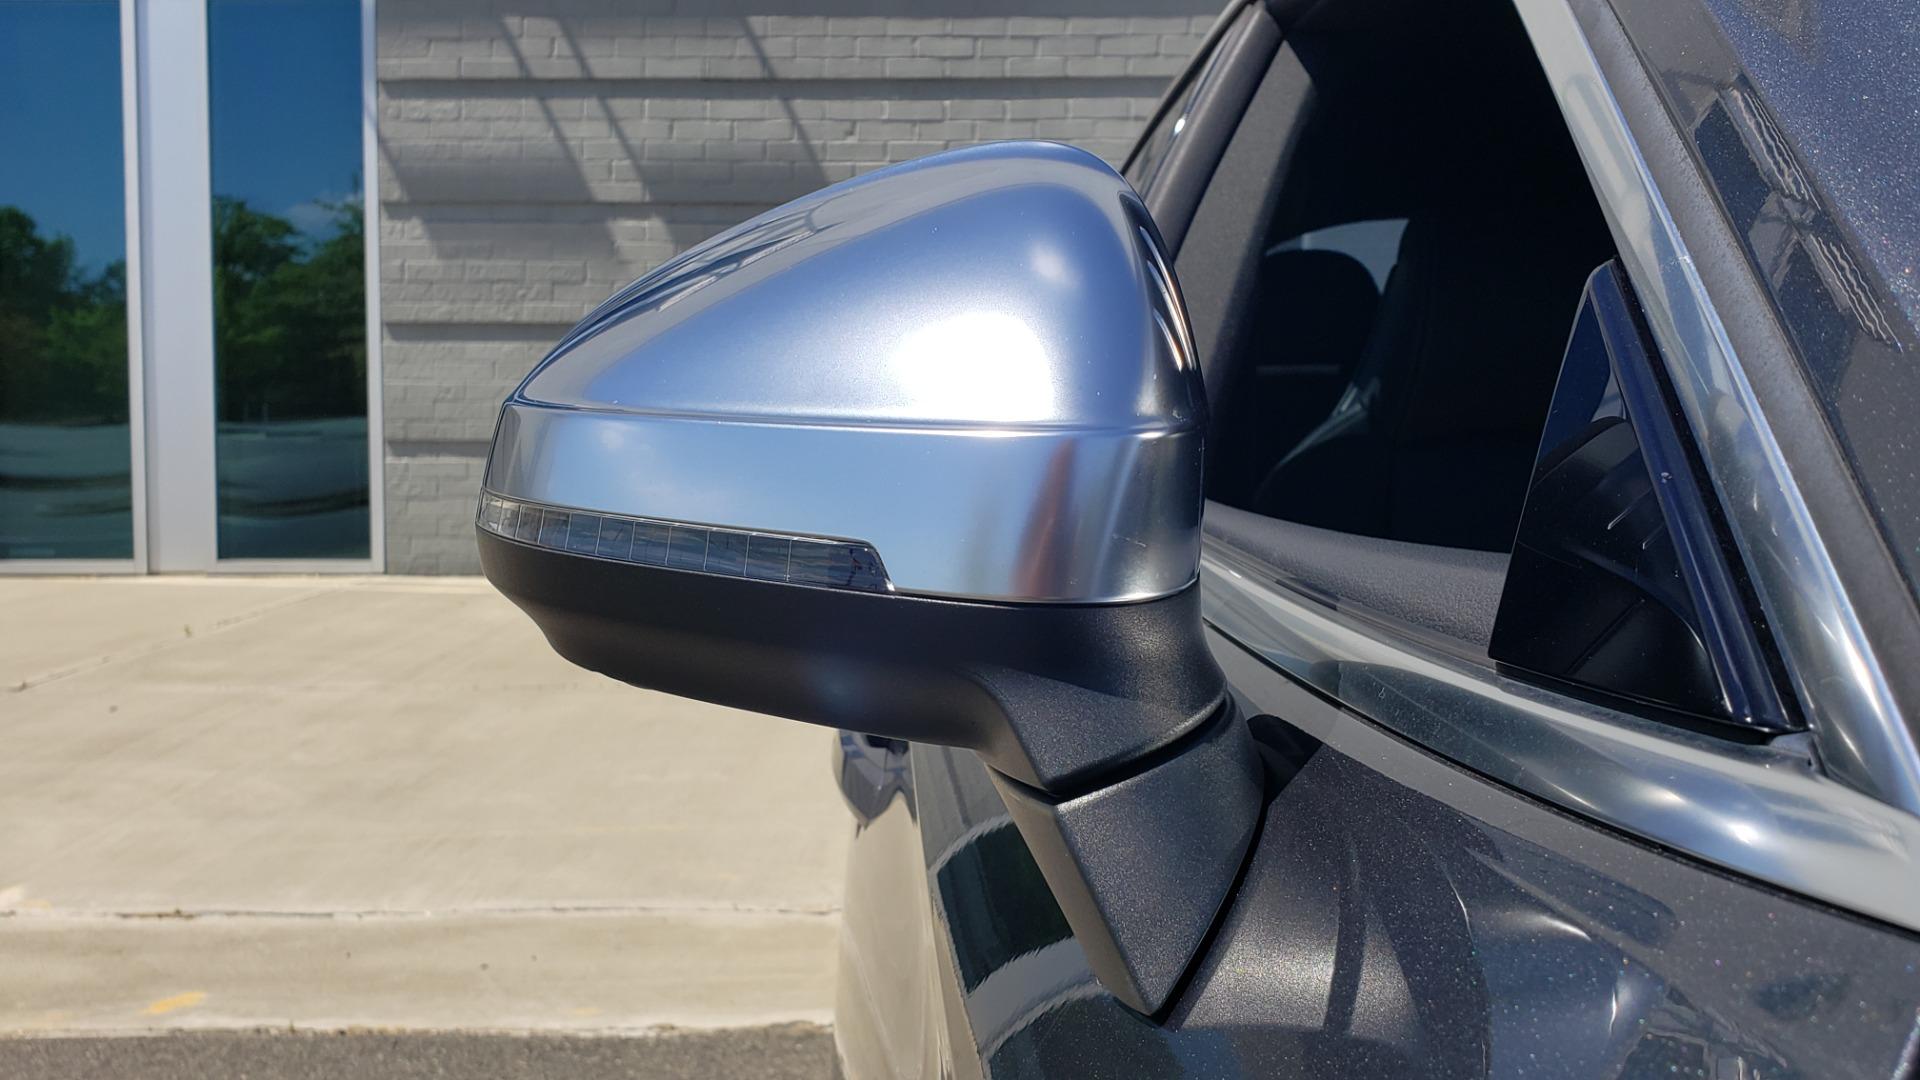 Used 2018 Audi S5 SPORTBACK PRESTIGE S-SPORT / NAV / SUNROOF / HUD / B&O SND / REARVIEW for sale $48,995 at Formula Imports in Charlotte NC 28227 25